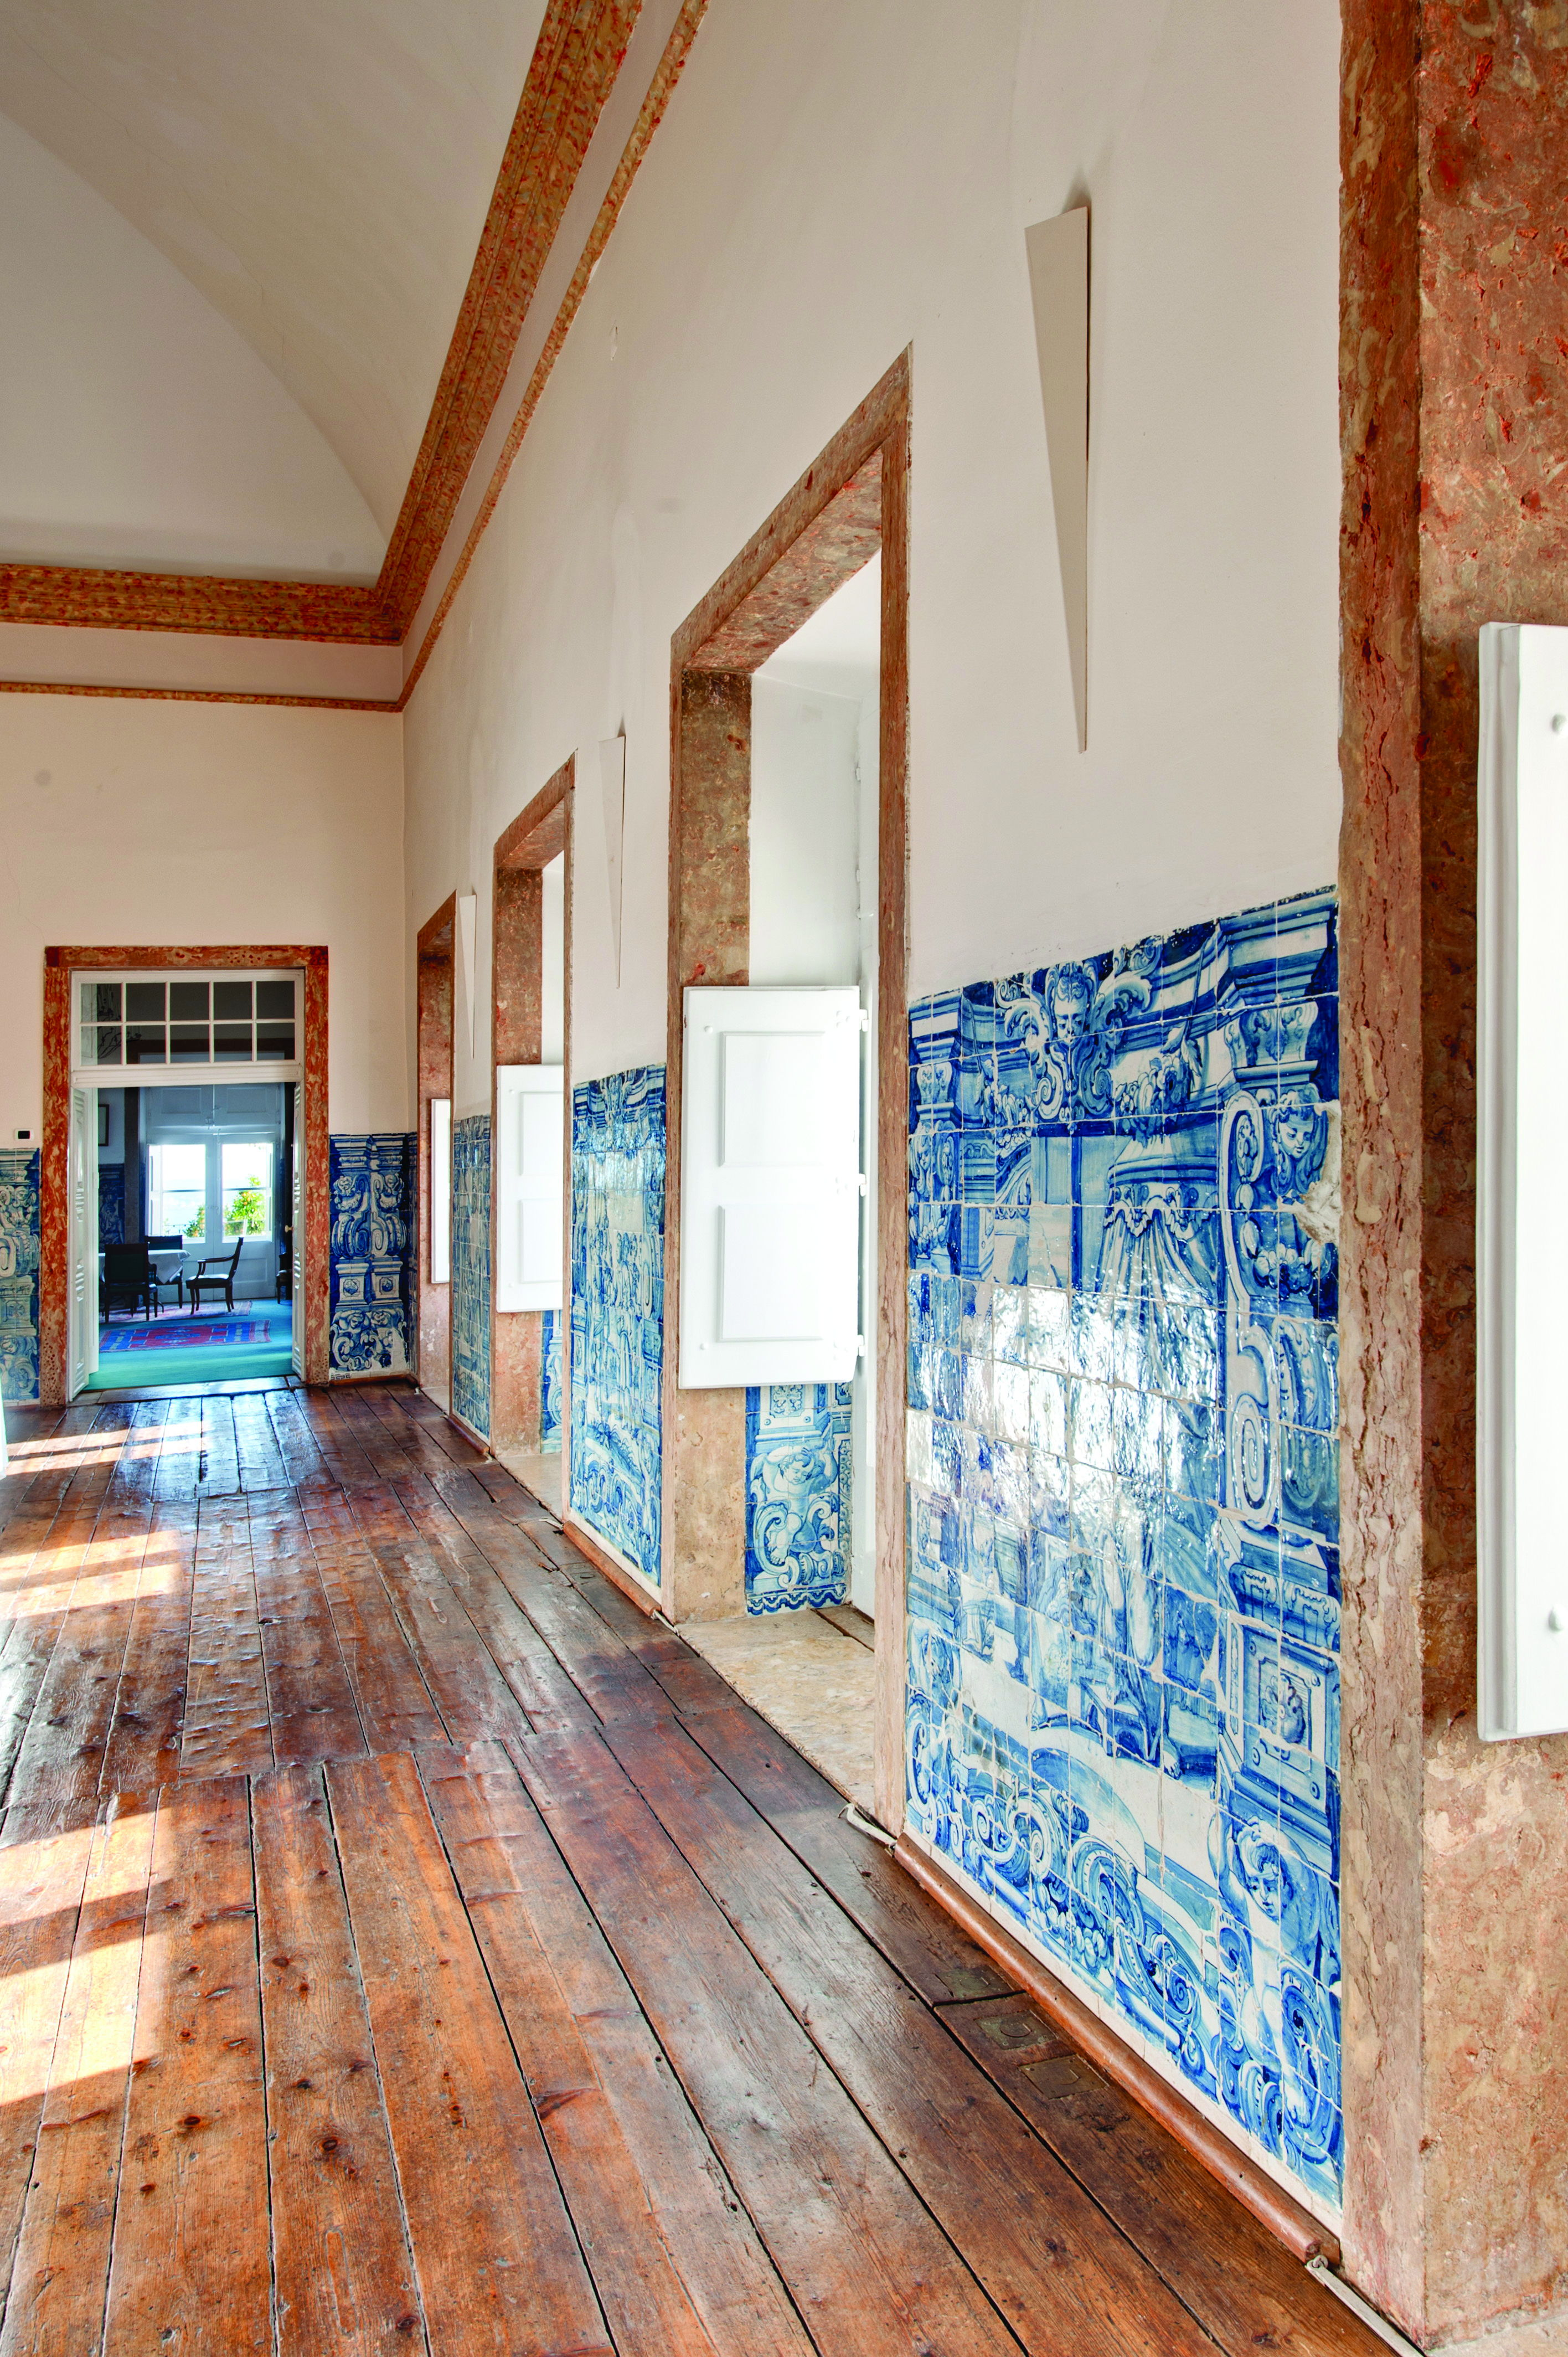 Palacio Belmonte 1º Maria Ursula #Lisbon #PalacioBelmonte #LuxuryHotels #TravelPortugal